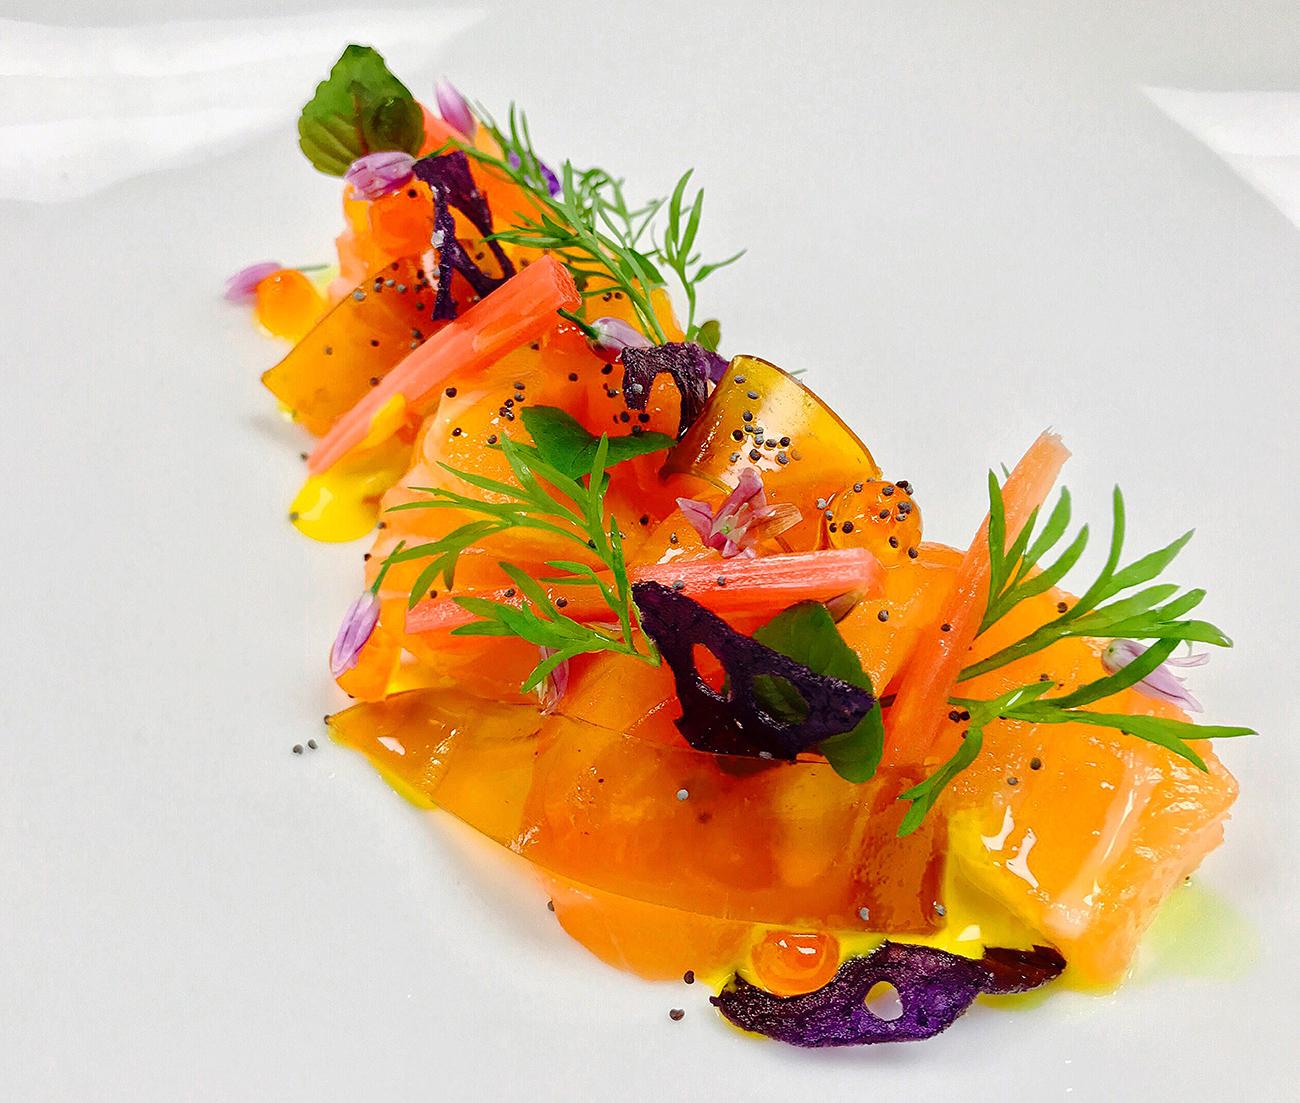 Hijiki Cured Salmon at Haiku a new luxury restaurant Miami